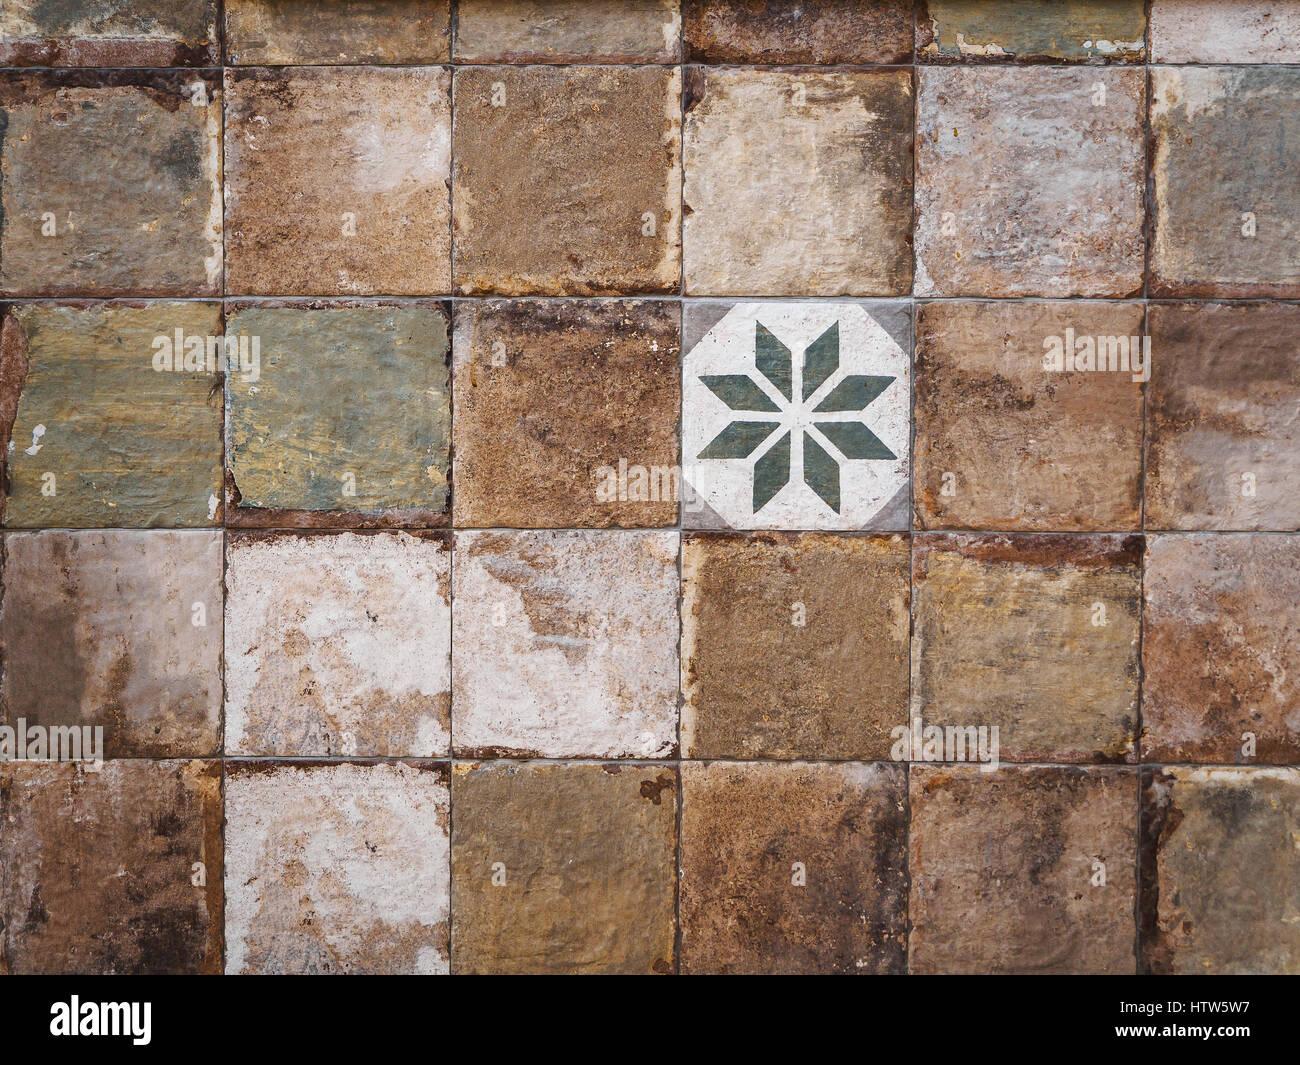 Colorful Vintage Ceramic Tiles Wall Decoration Stock Photo Alamy